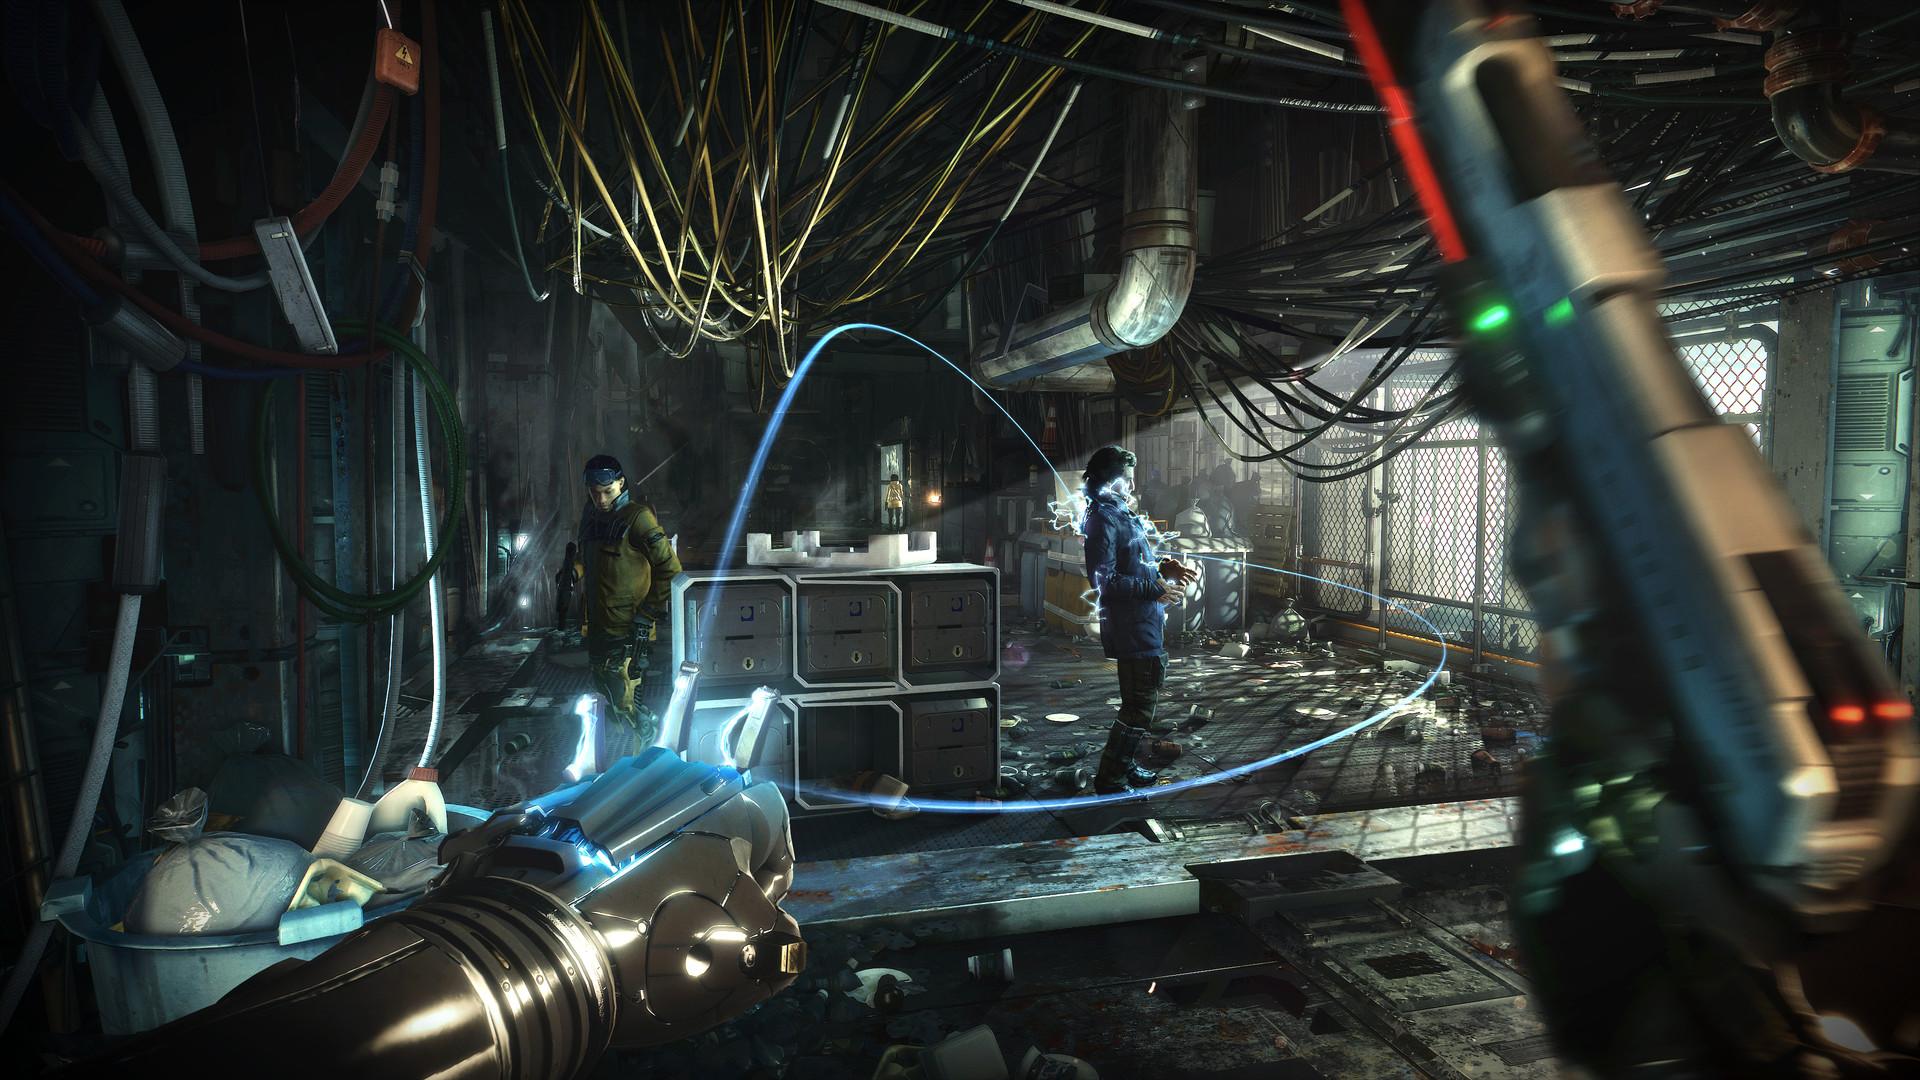 Deus Ex Mankind Divided ESPAÑOL Descargar Full (CPY) + REPACK 8 DVD5 (JPW) 9